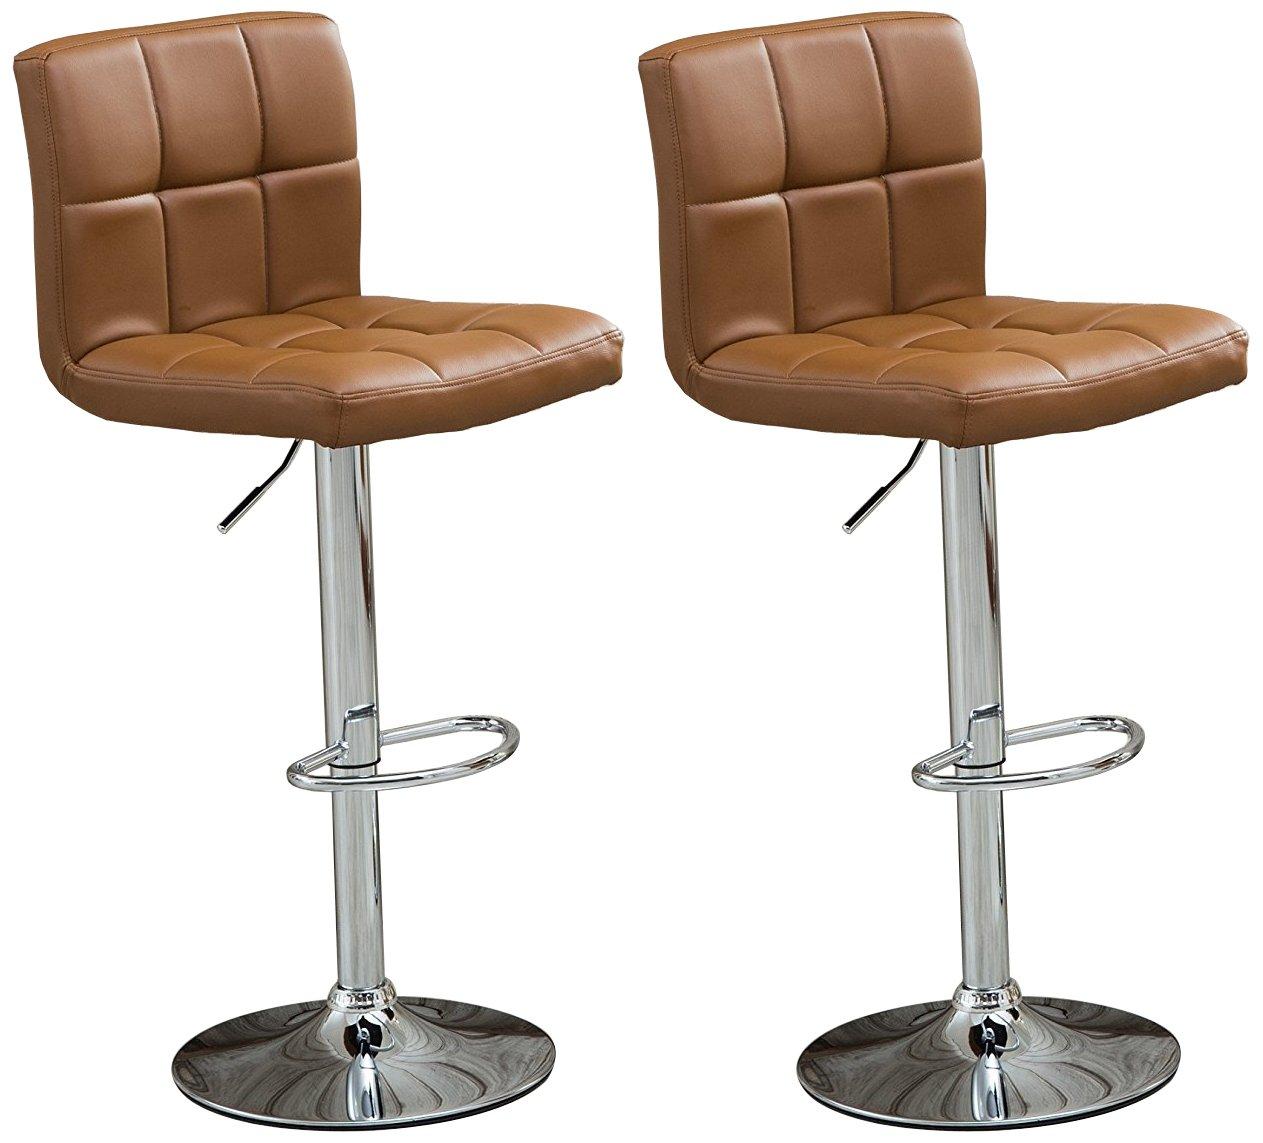 Roundhill Furniture Swivel Leather Bar Stools